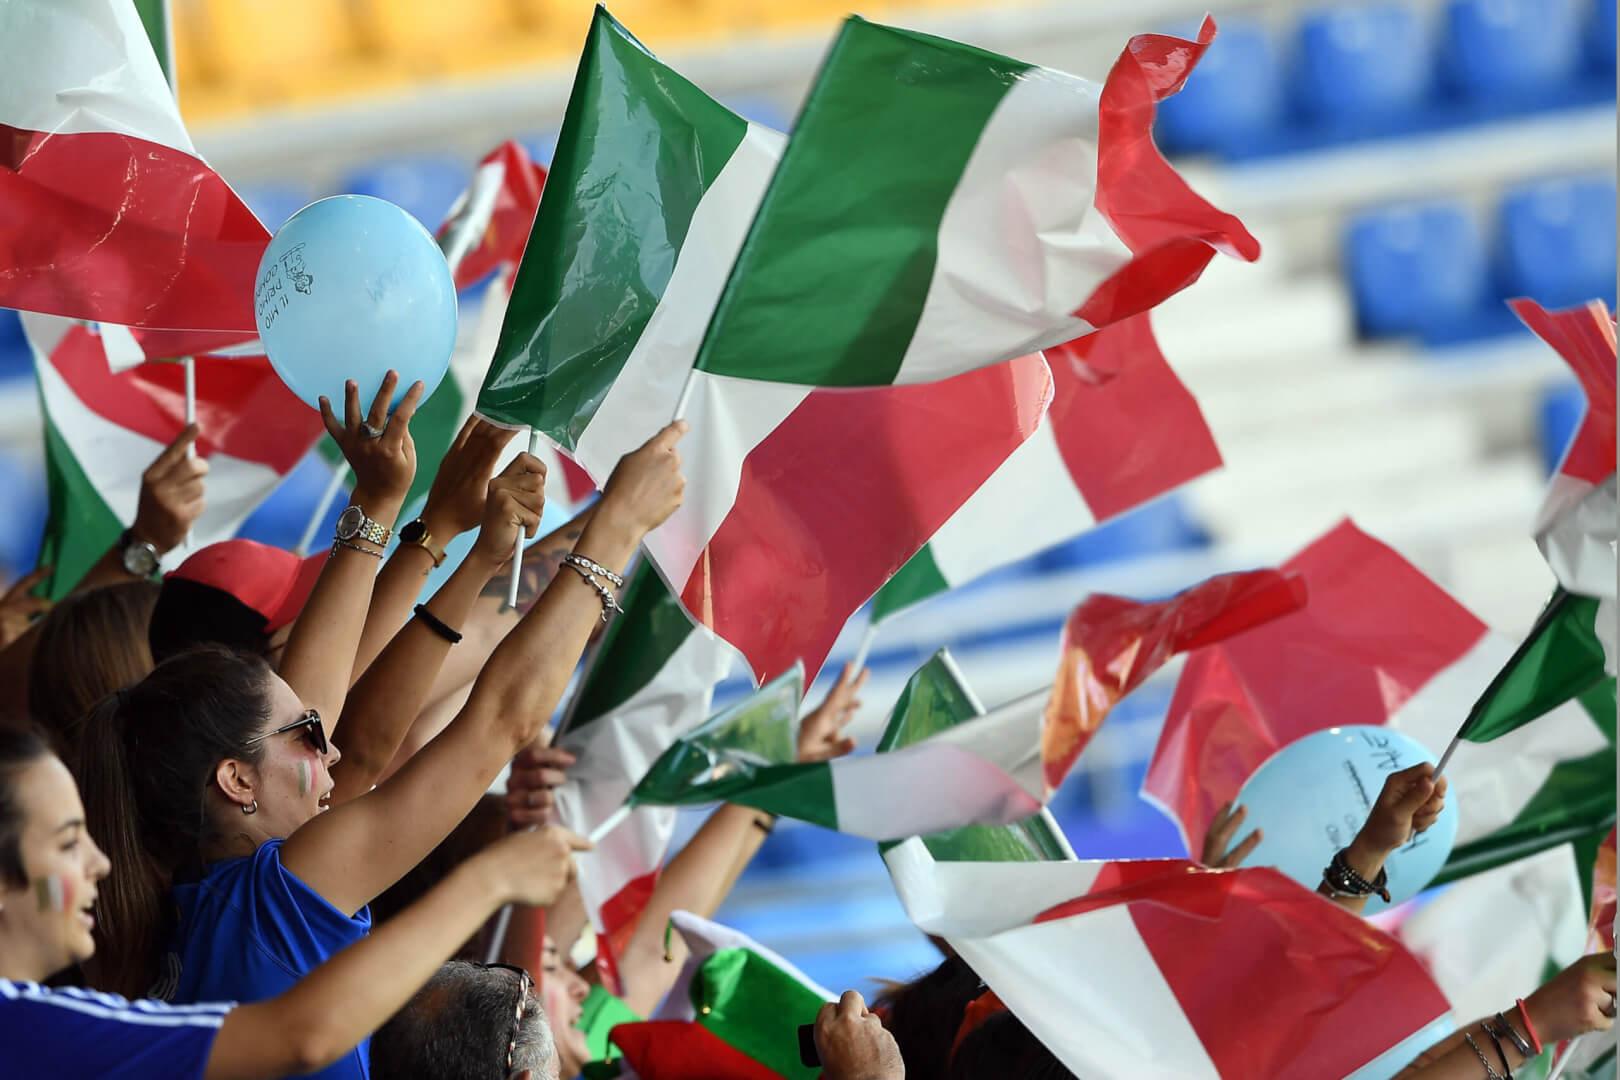 italia e spagna semifinali